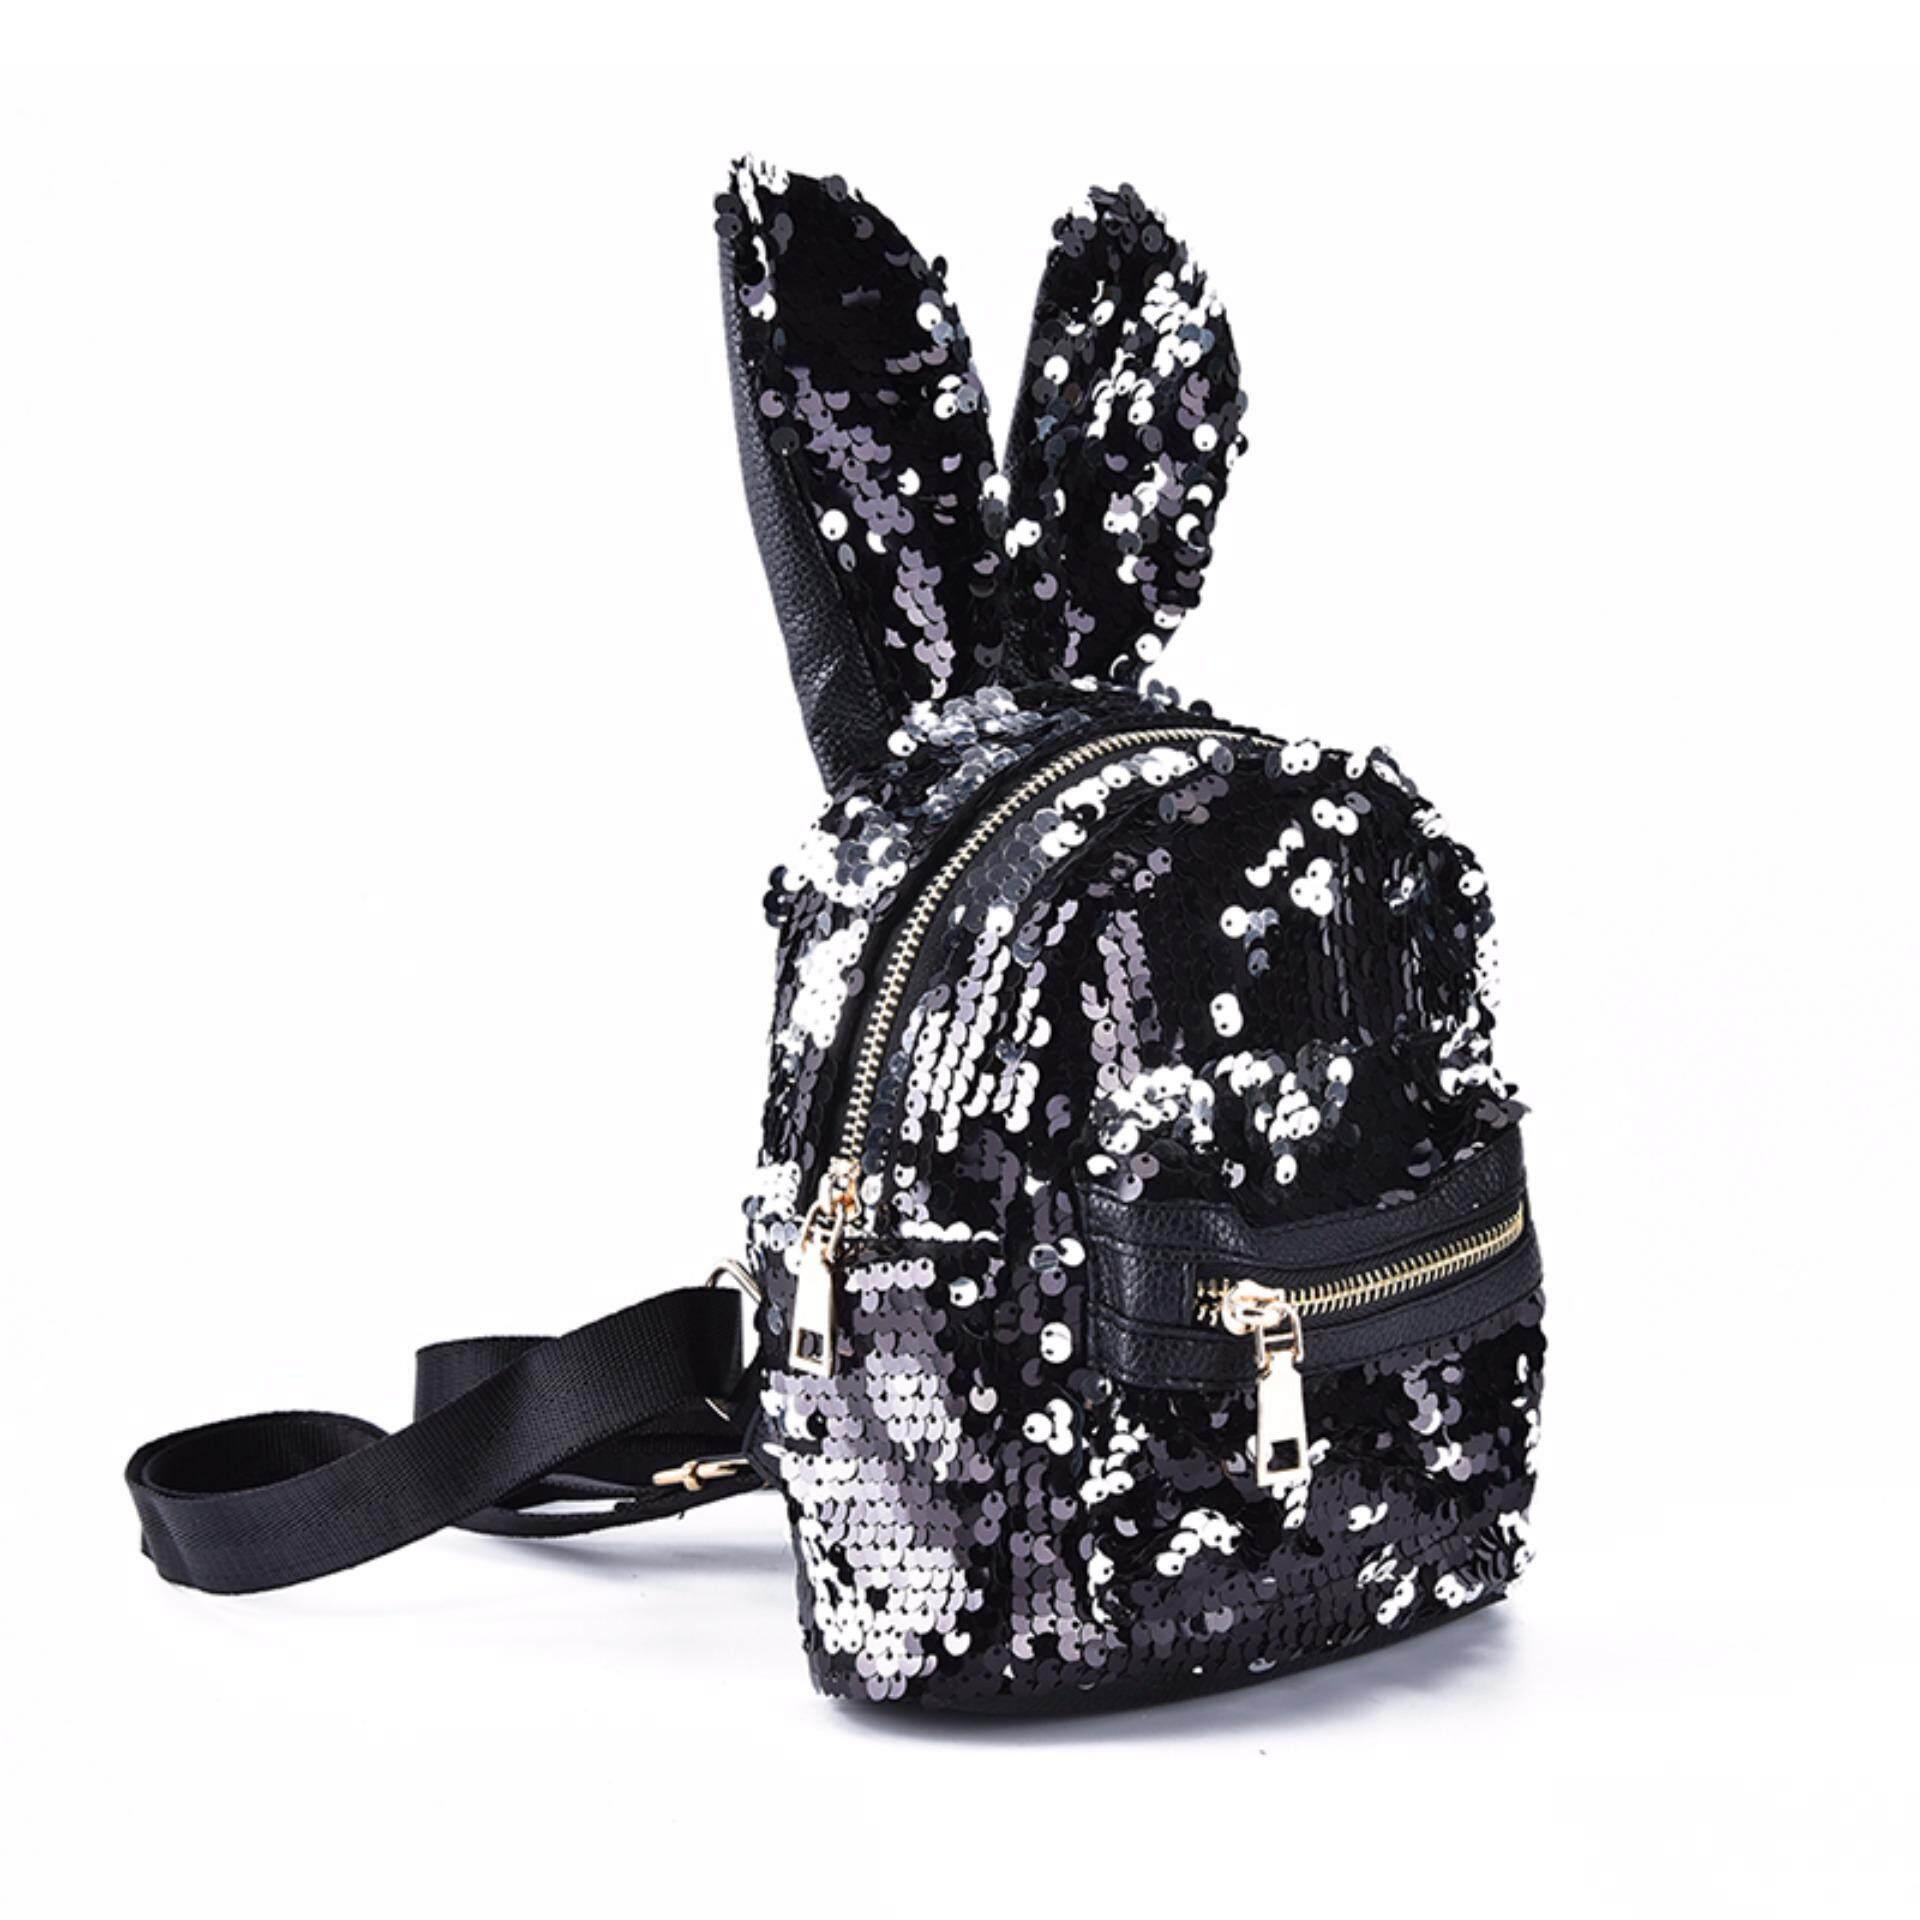 b014b498f4 Shinning Bling Sequins Cute Big Rabbit Ears Backpack Girls Women Mini  Travel Bag Black Anti-